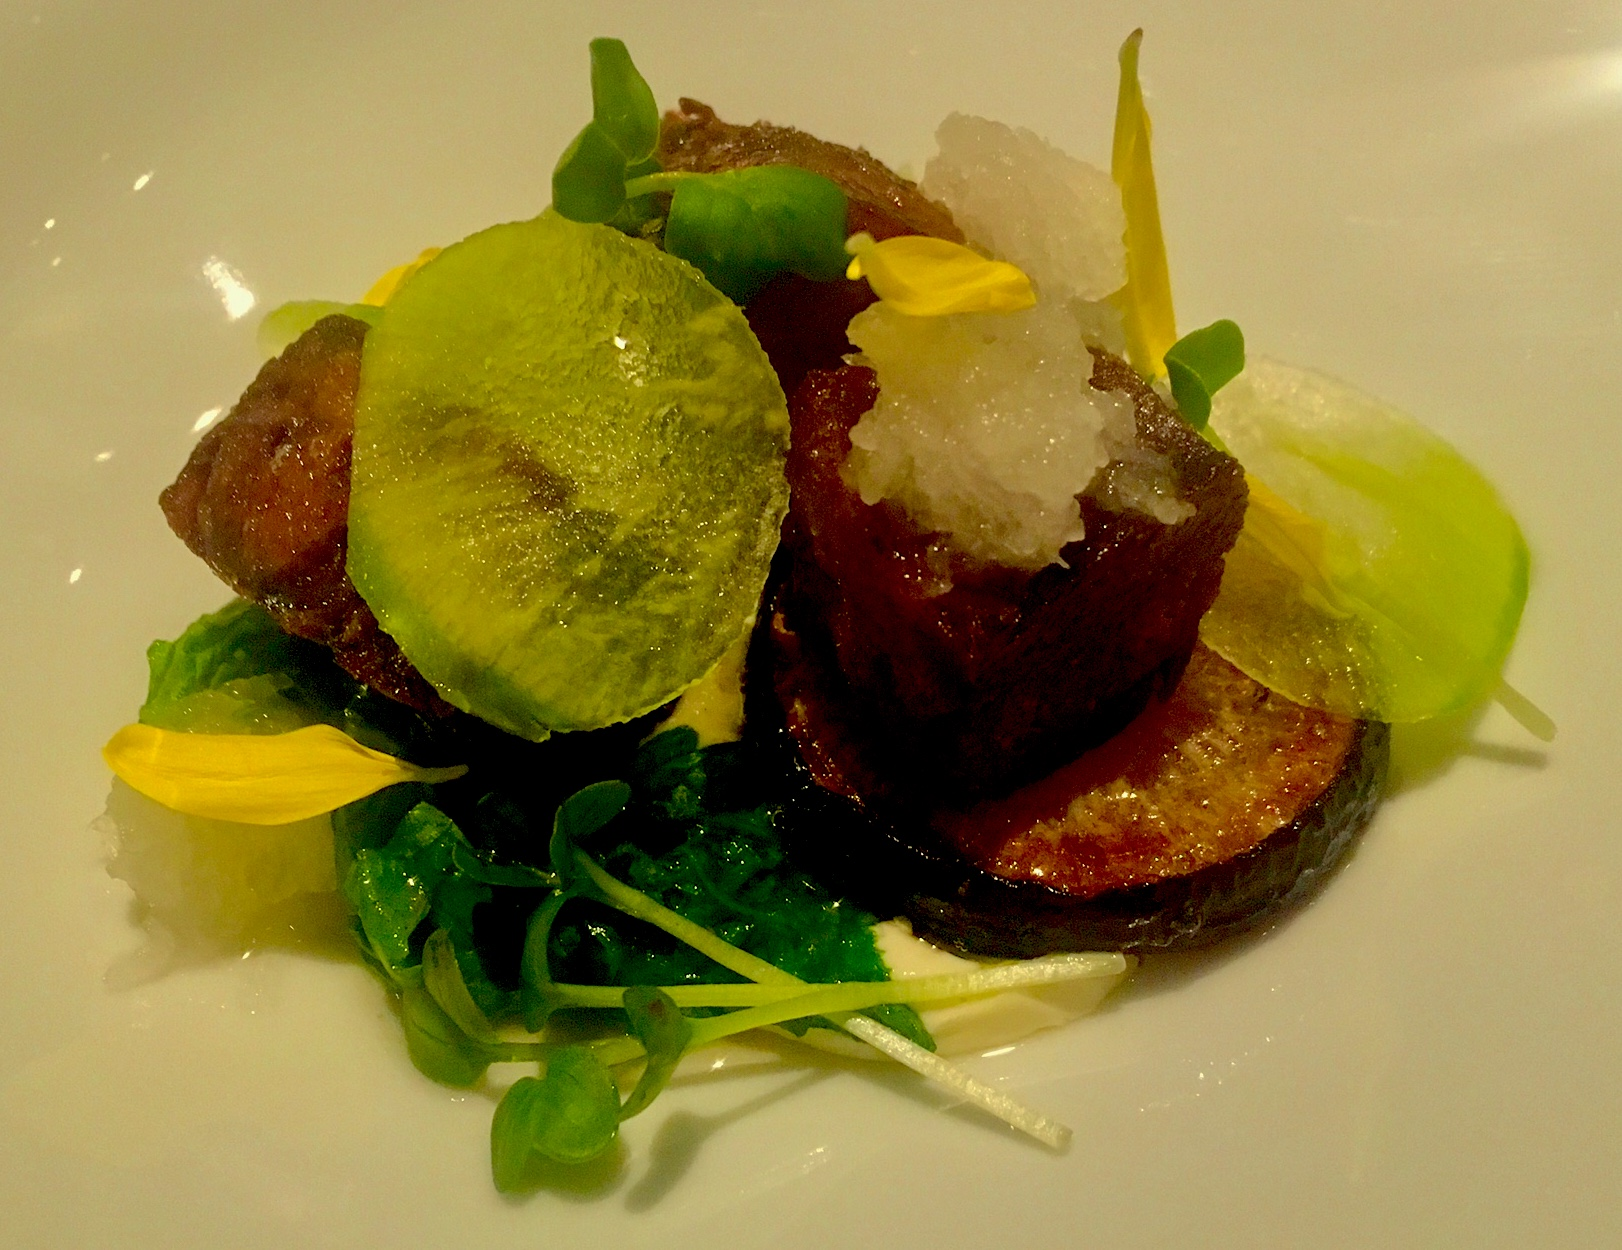 Alexander's Steakhouse dish